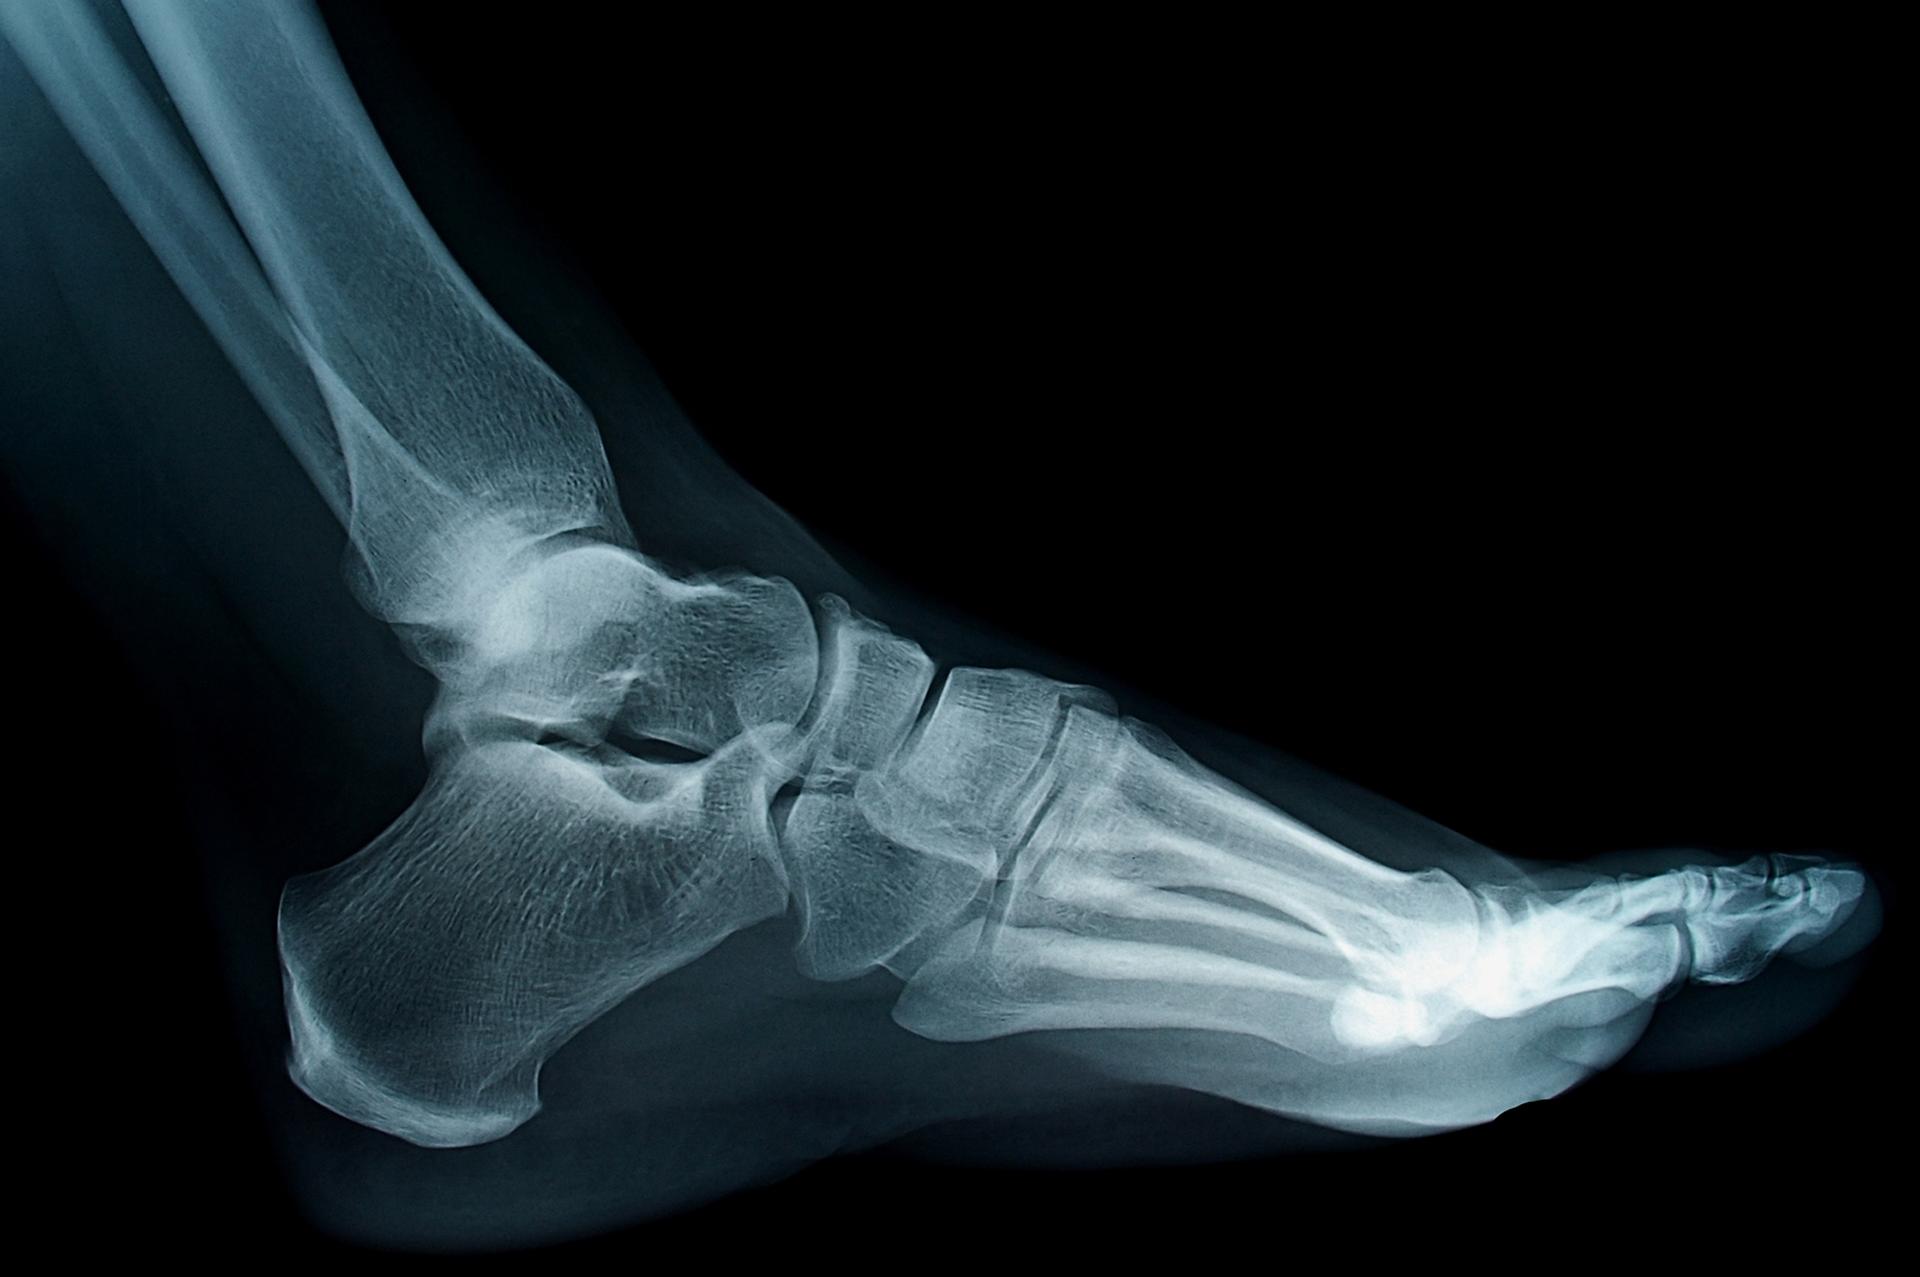 Foot Surgery London Xray